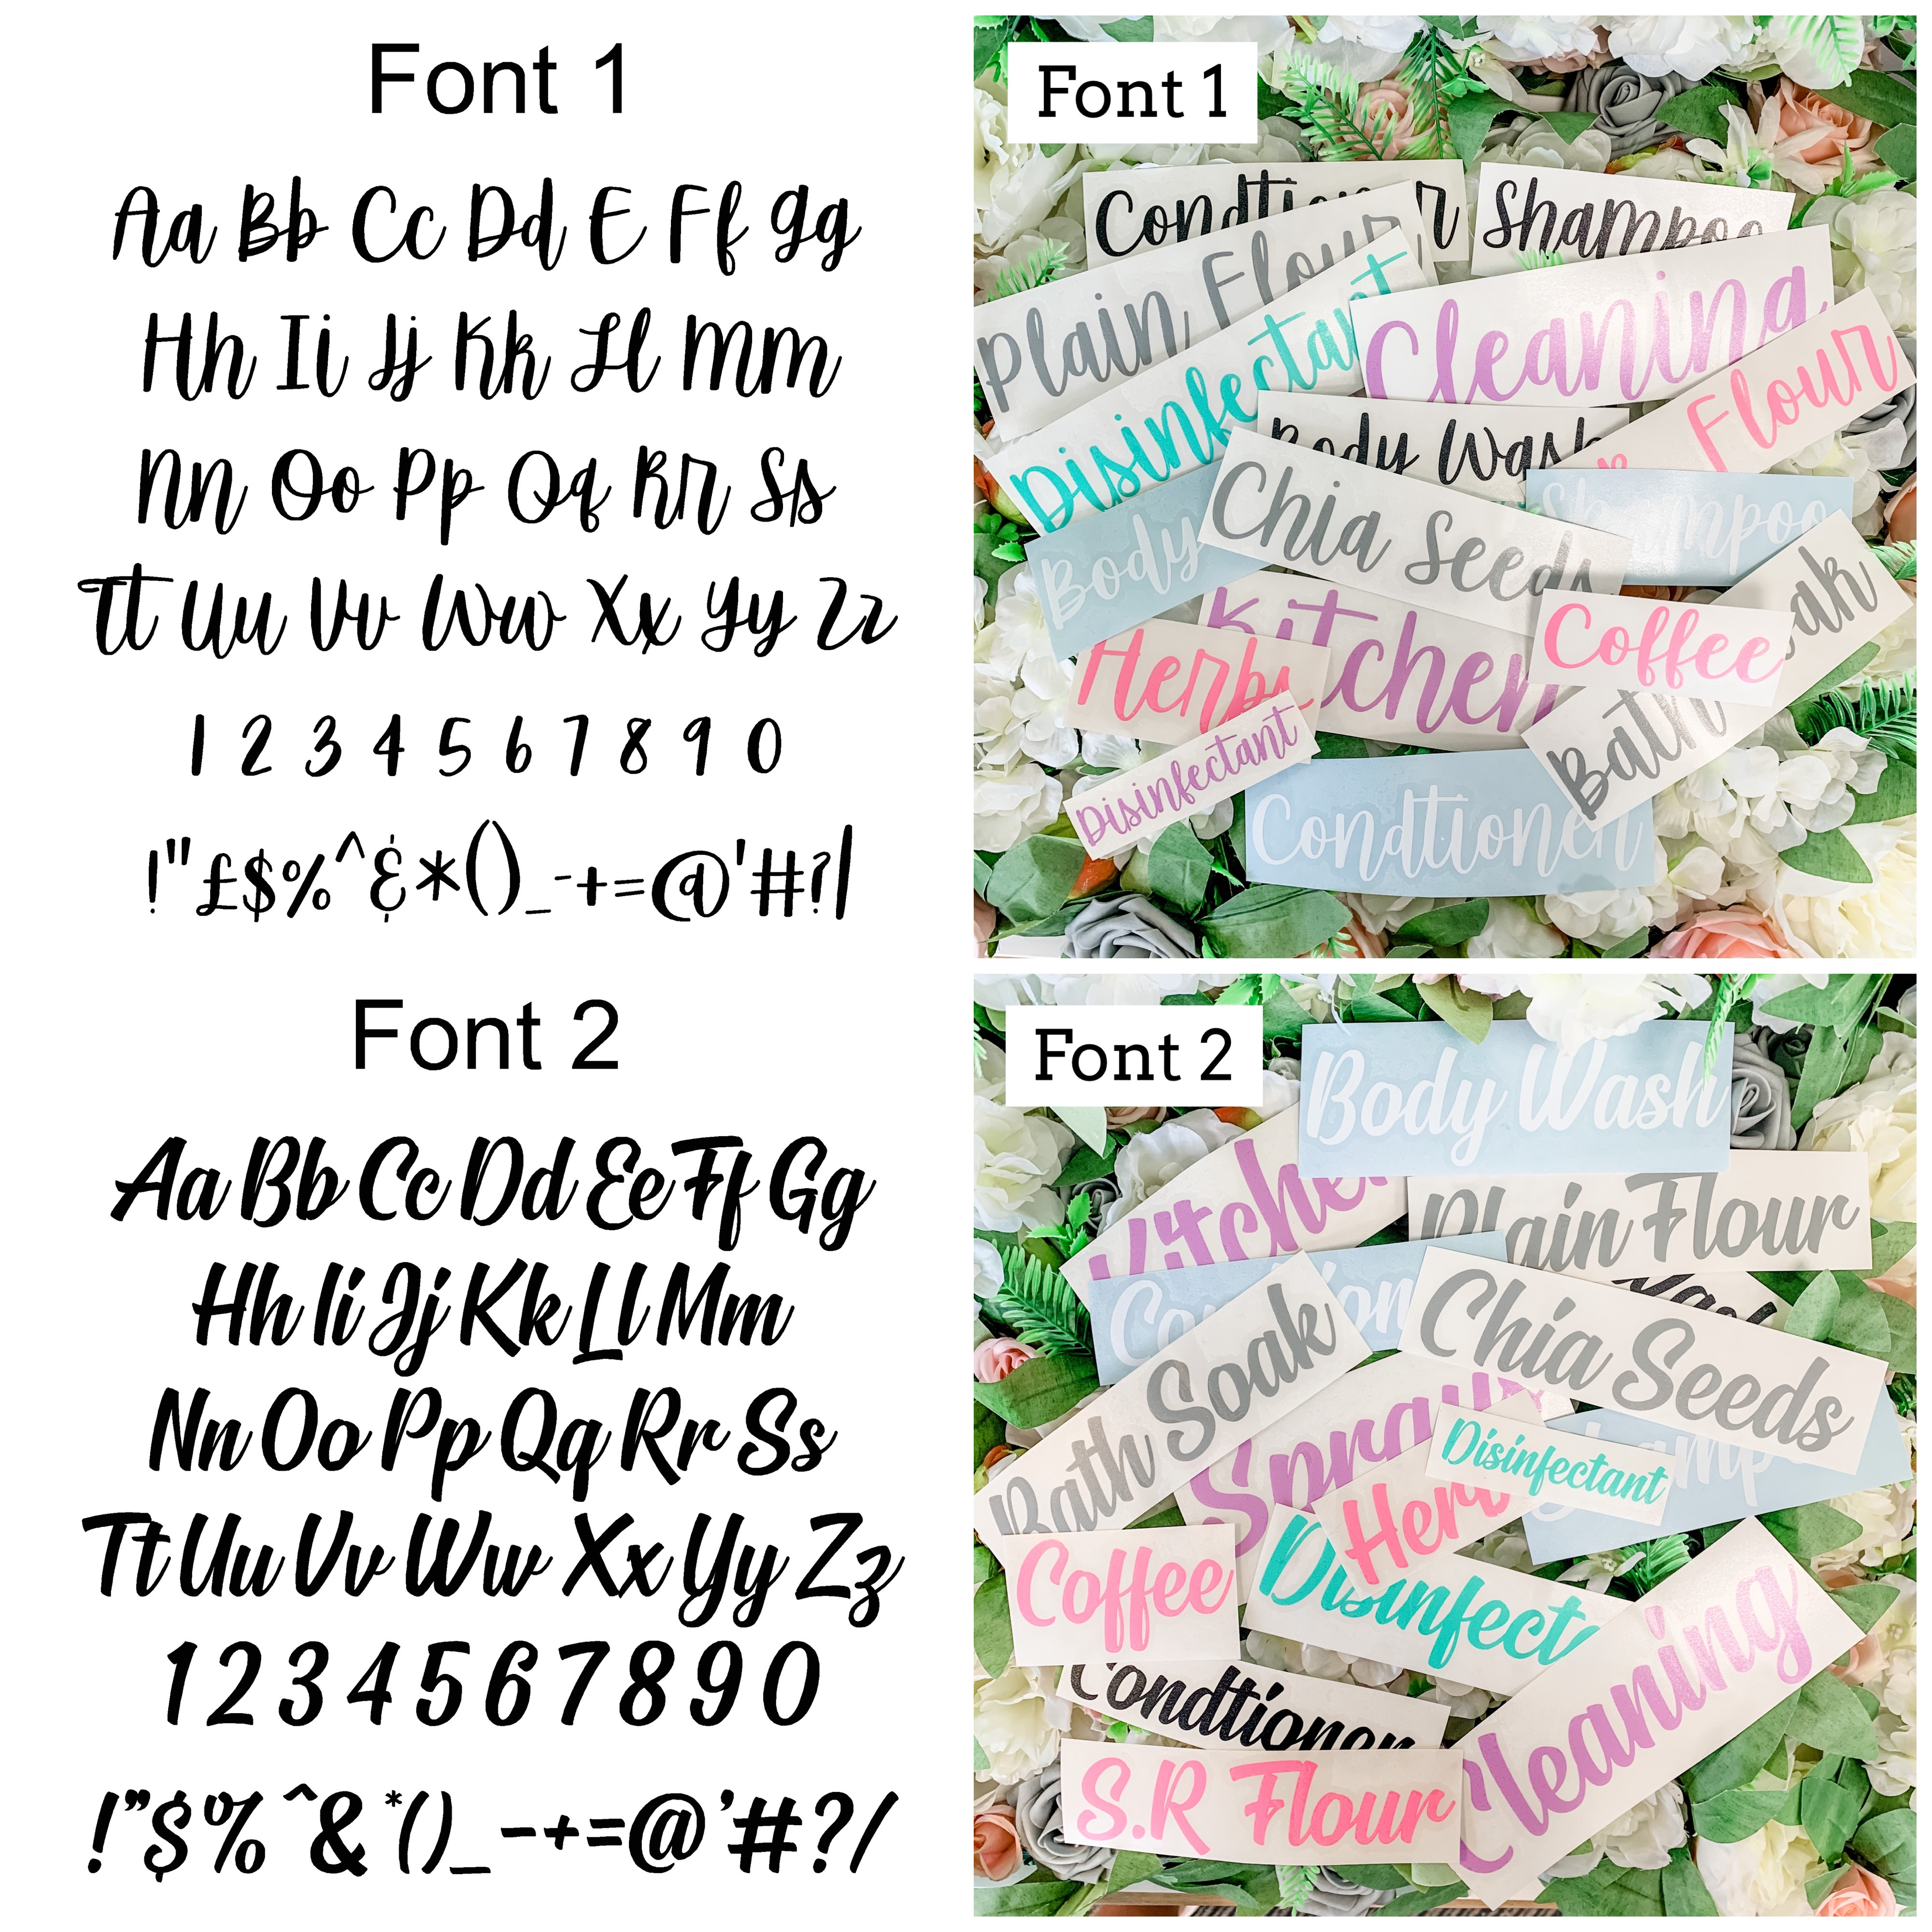 7fc41563-e1de-4b47-983b-905275d6e89c.jpeg